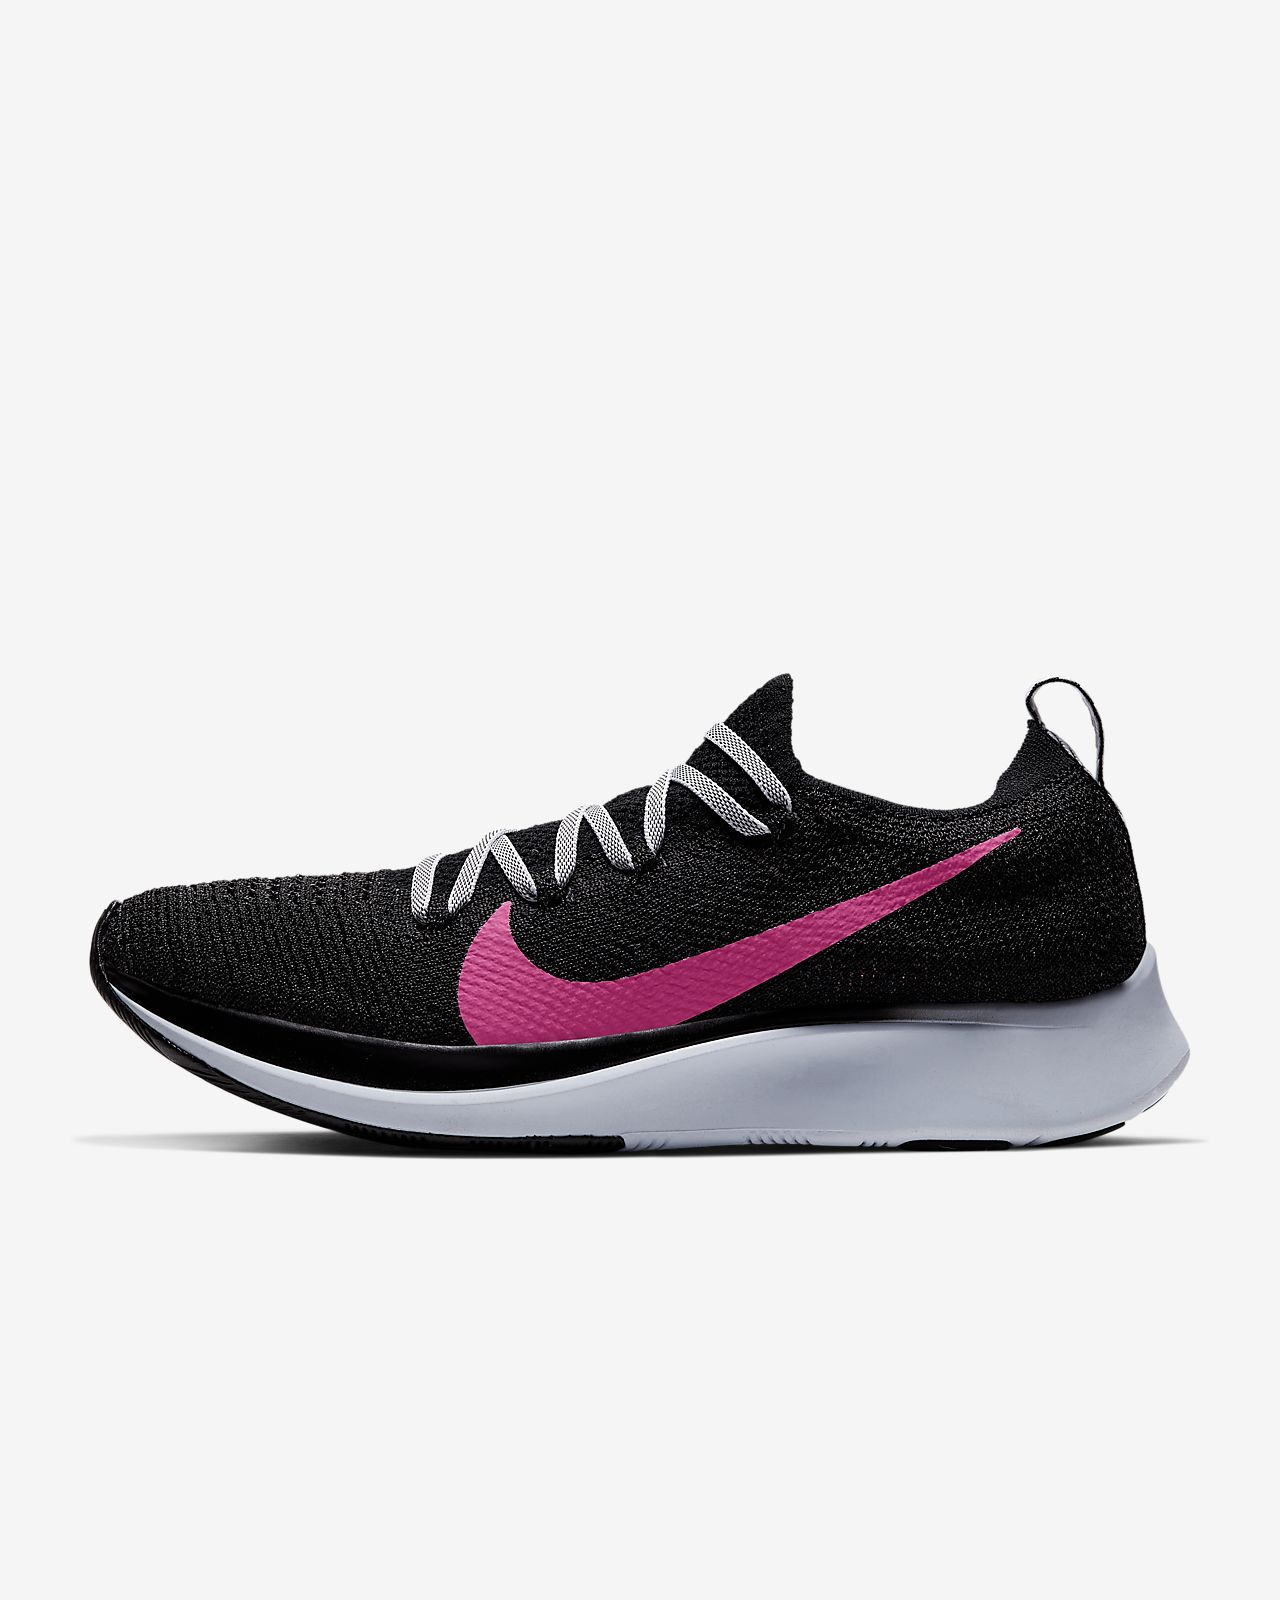 ff0621b775be Nike Zoom Fly Flyknit Women s Running Shoe. Nike.com BE